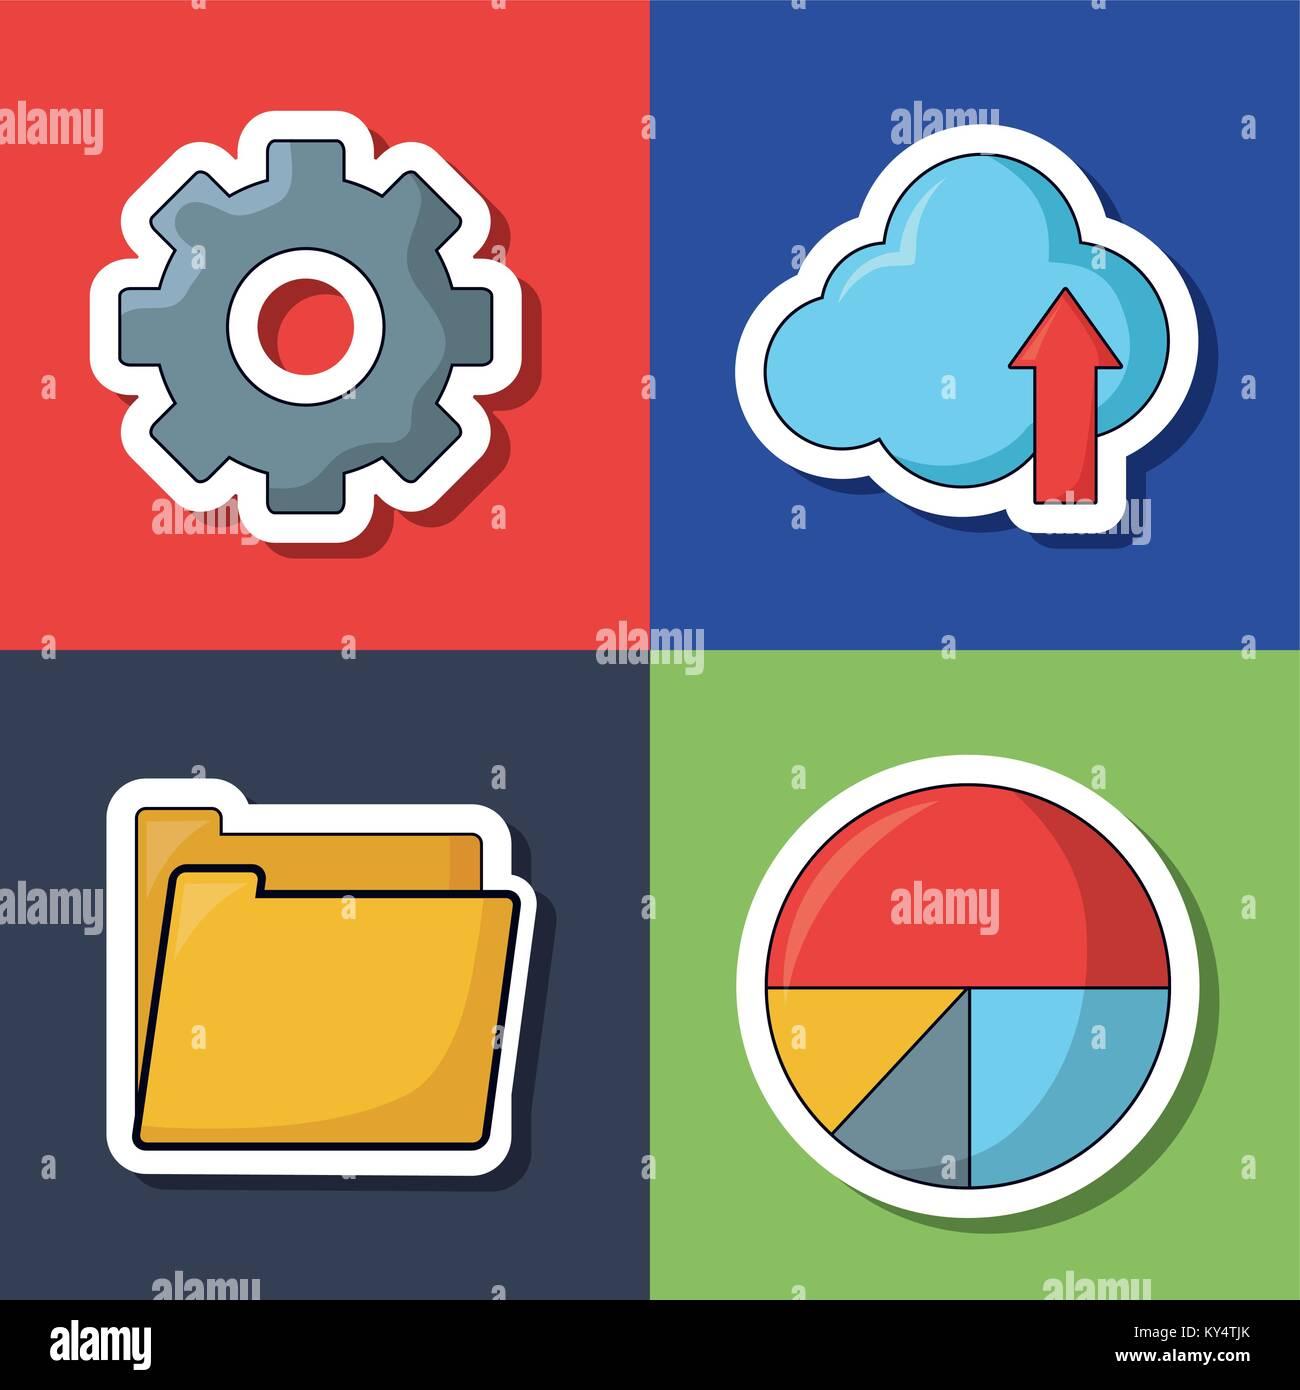 seo search engine optimisation and marketing icon  - Stock Image